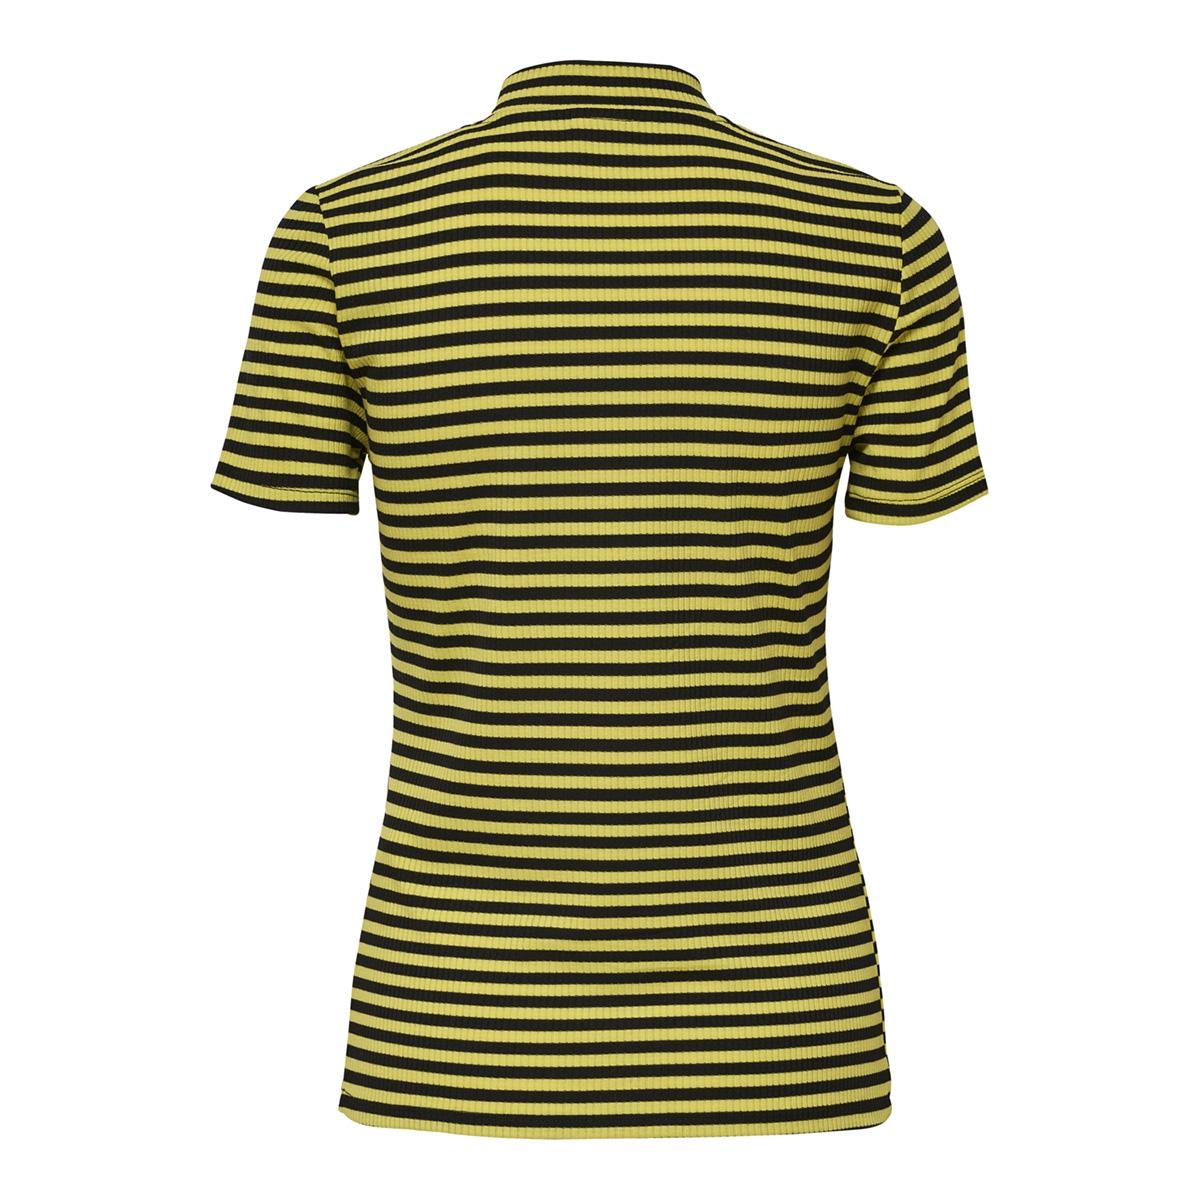 jdysonja s/s high neck top jrs 15168364 jacqueline de yong t-shirt green sheen/black